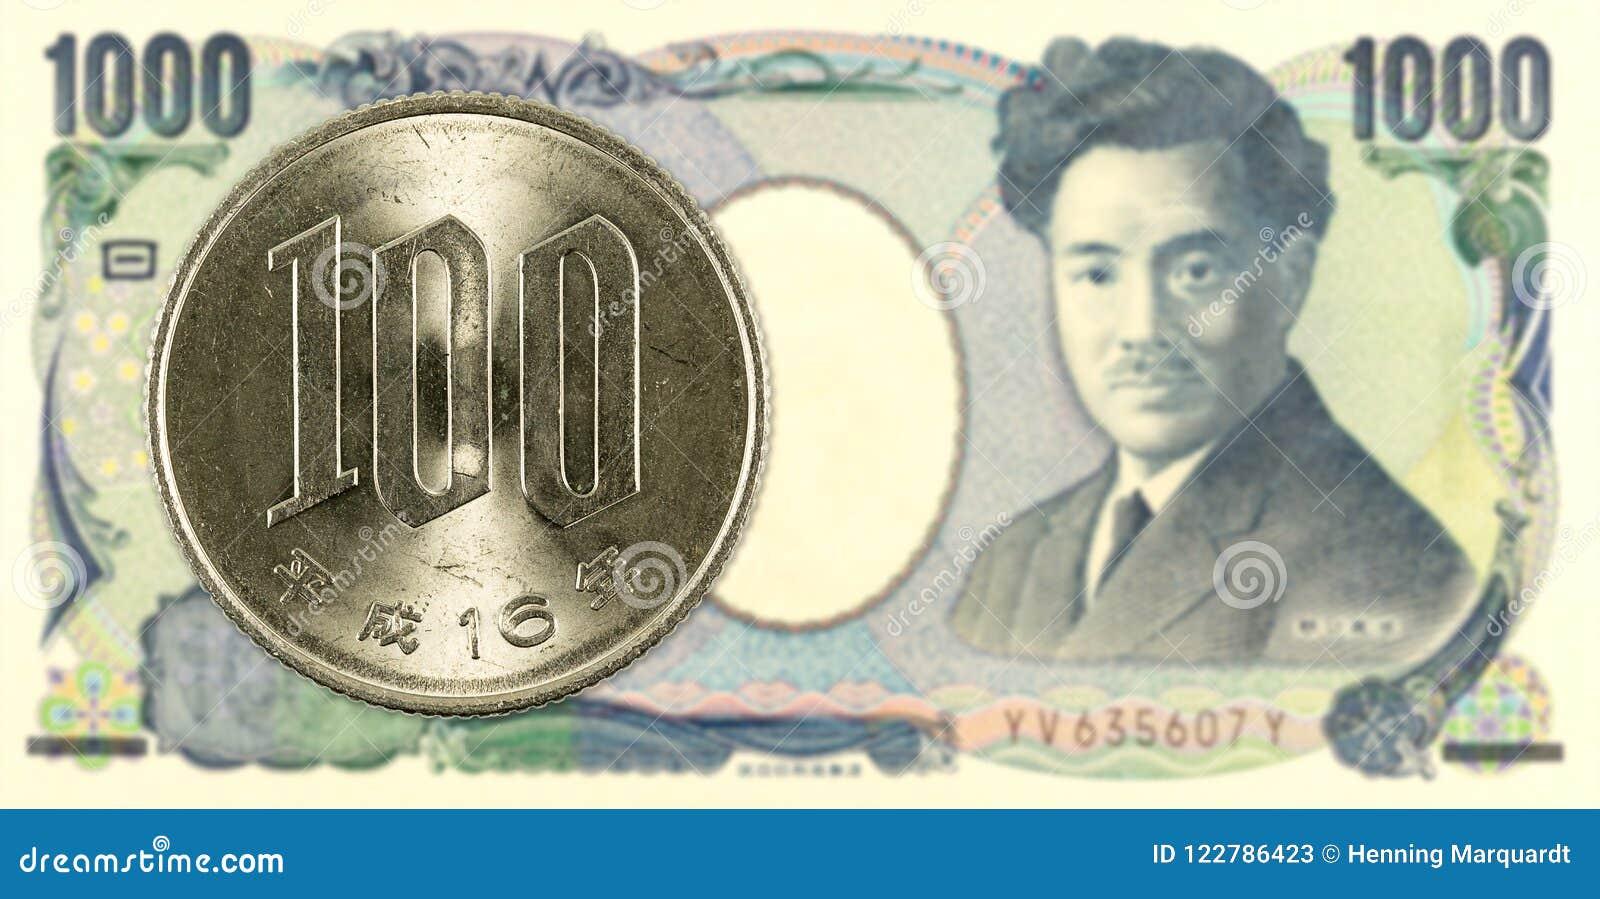 100 yenes japoneses acuñan contra billete de banco de 1000 yenes japoneses